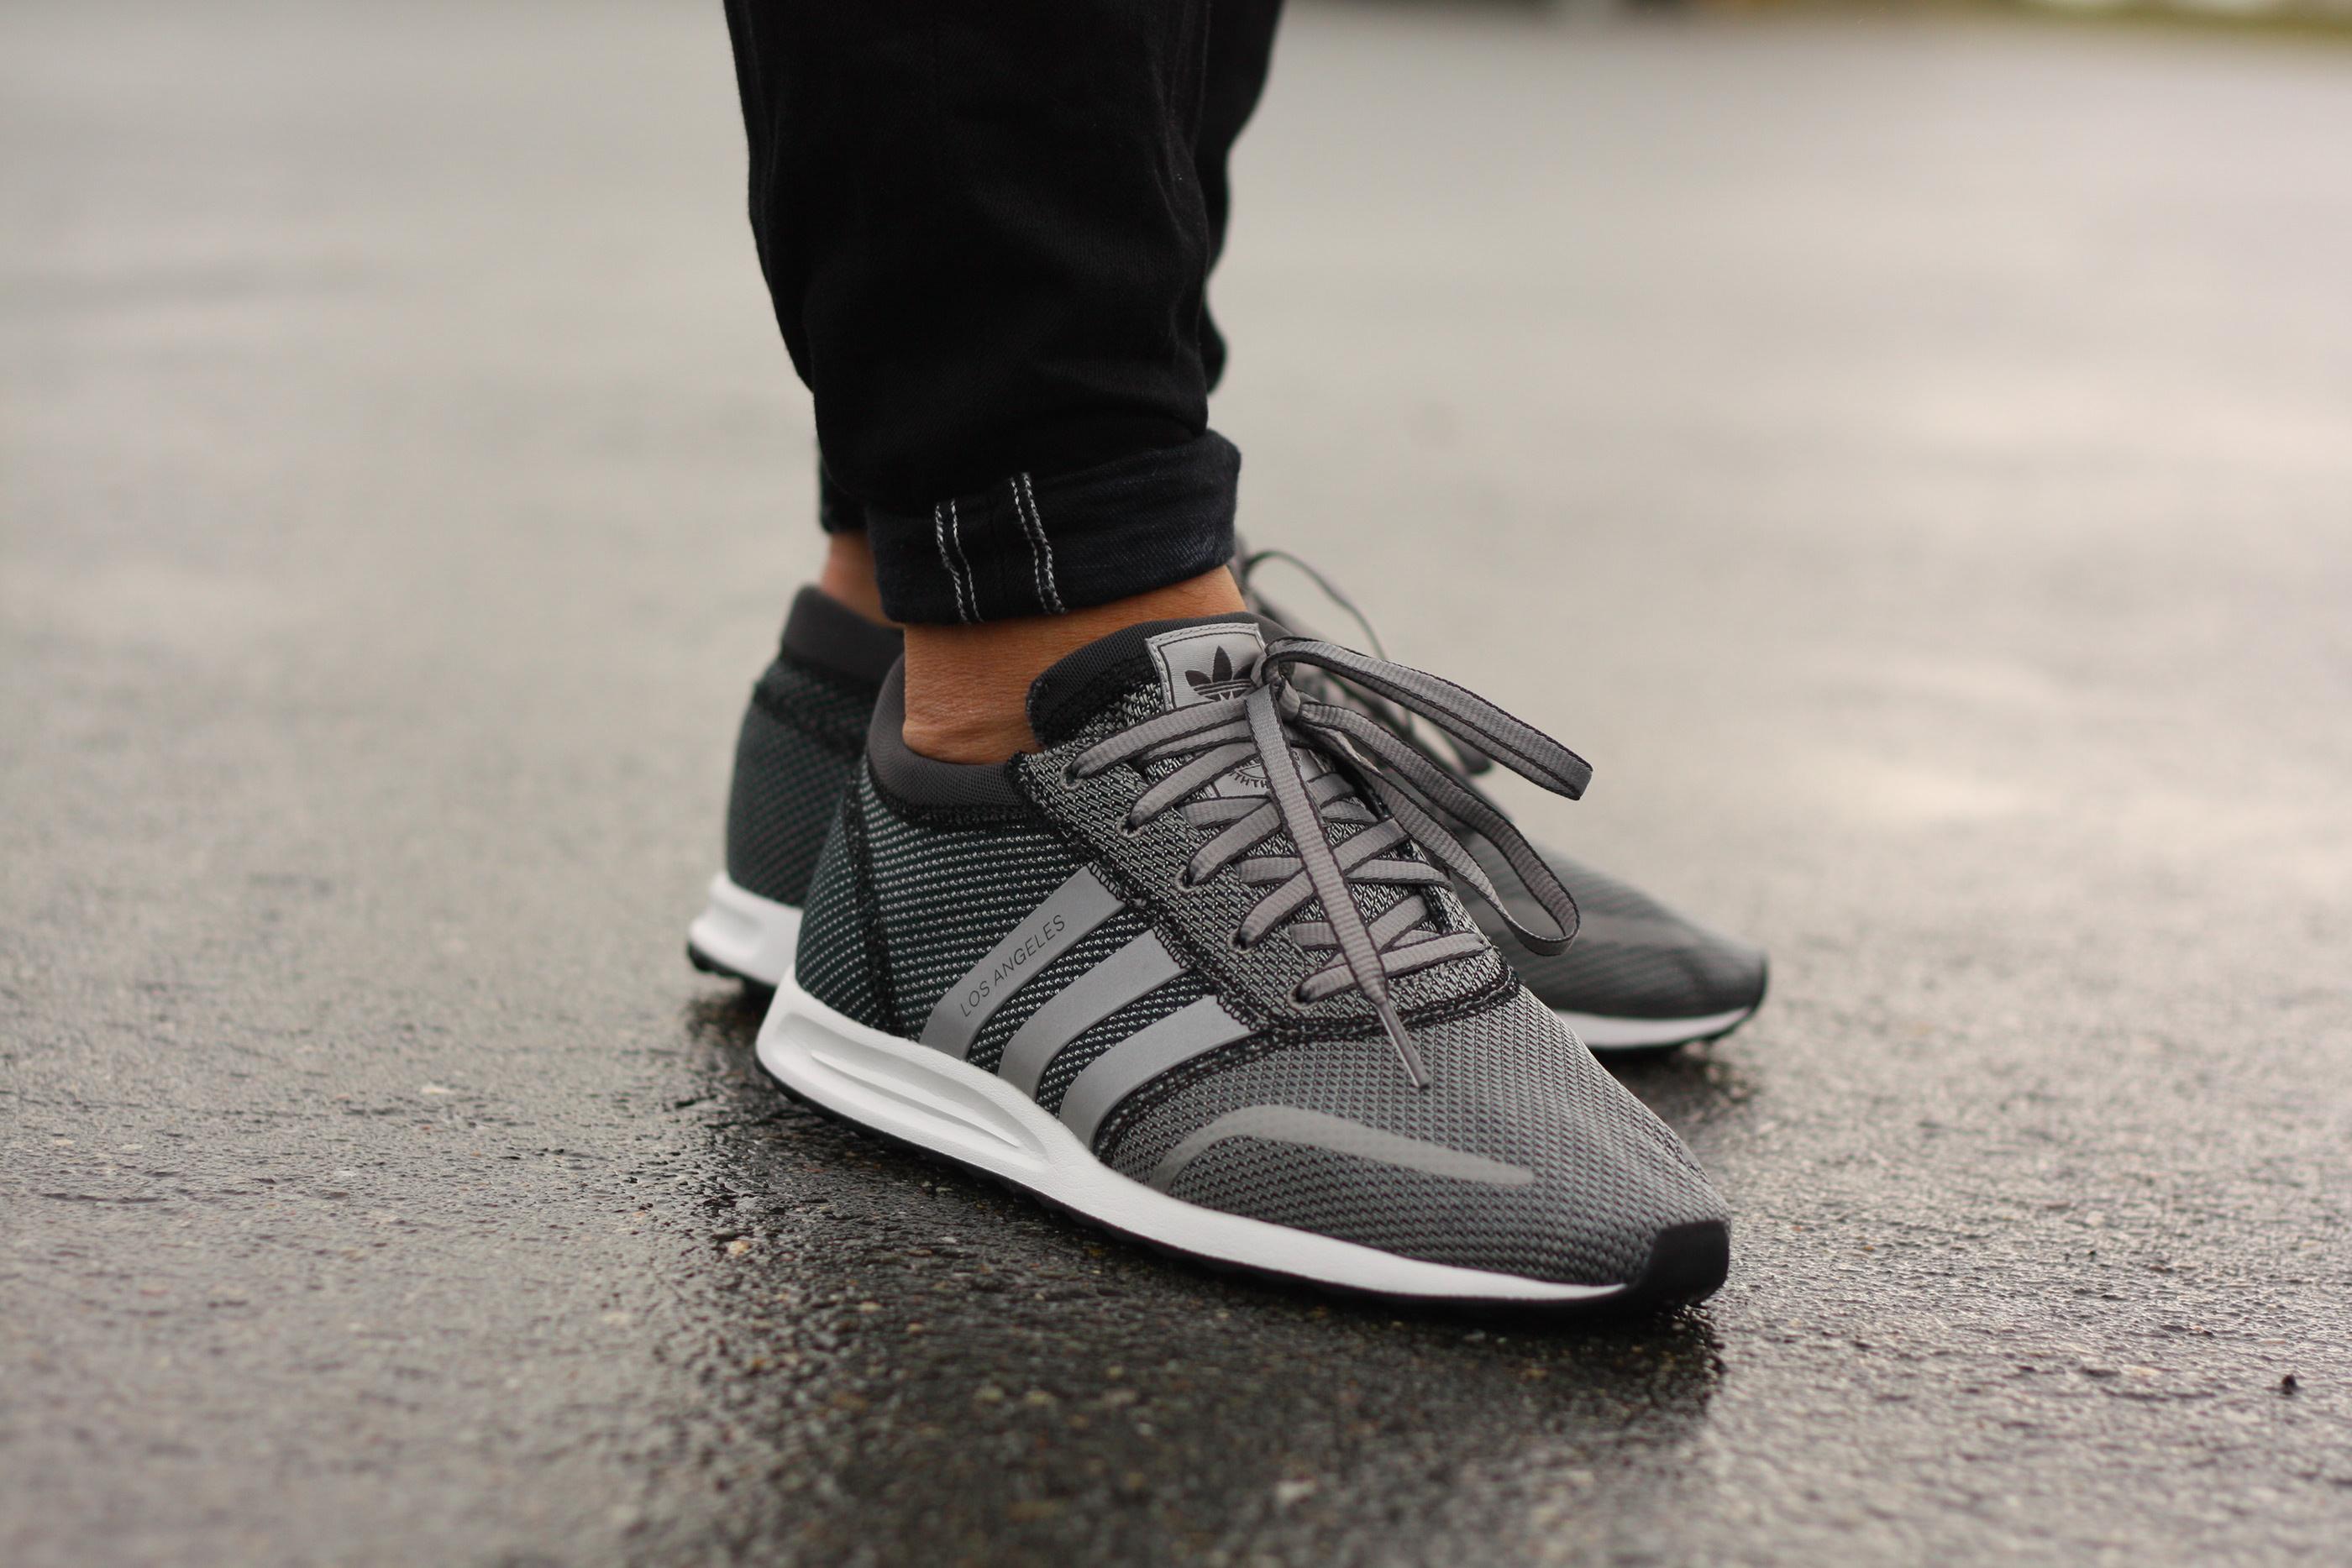 Adidas Originals Los Angeles on Behance